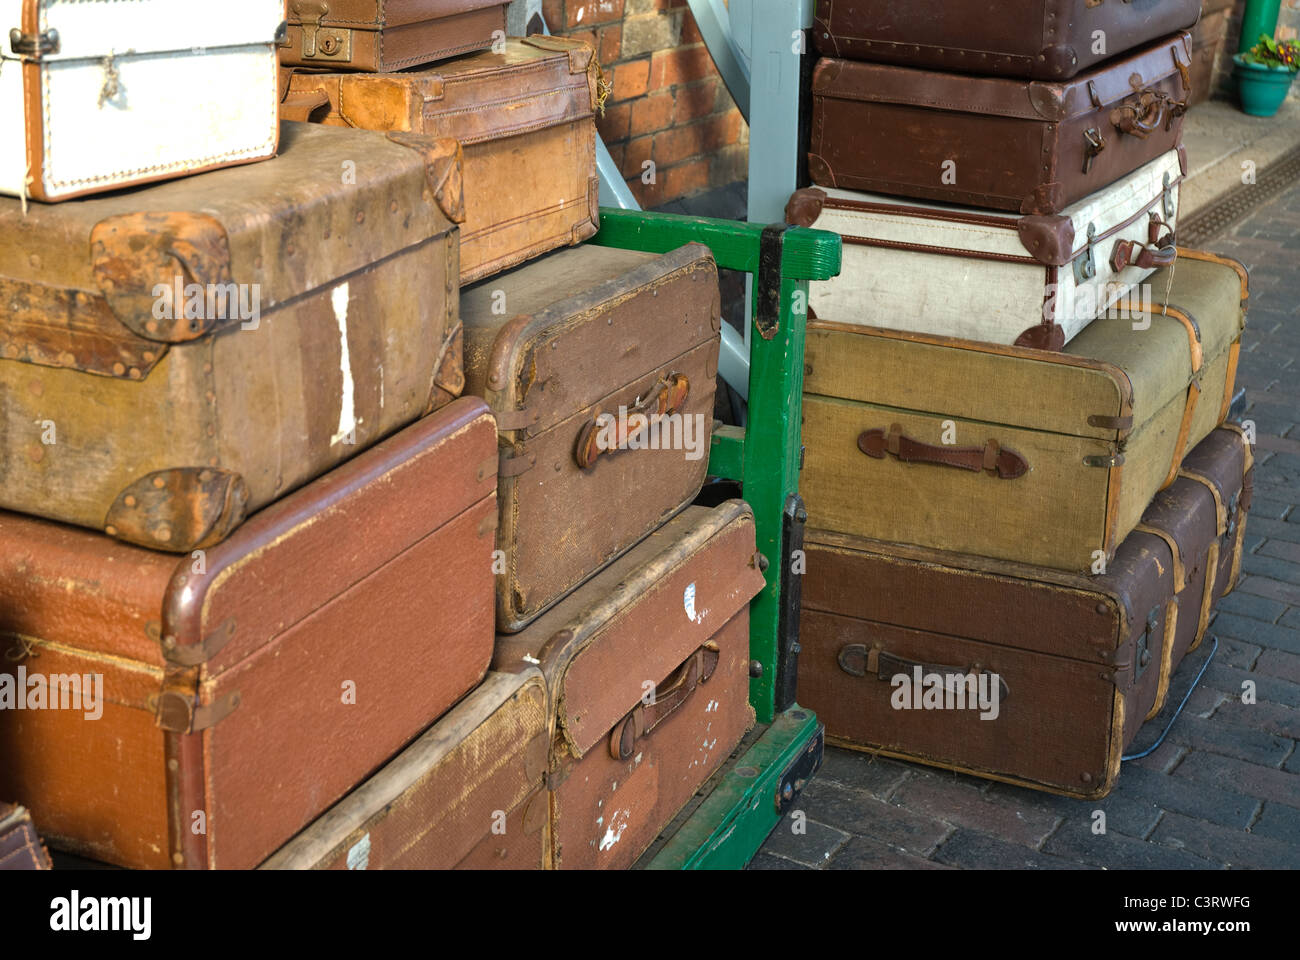 Travel luggage on a railway platform - Stock Image